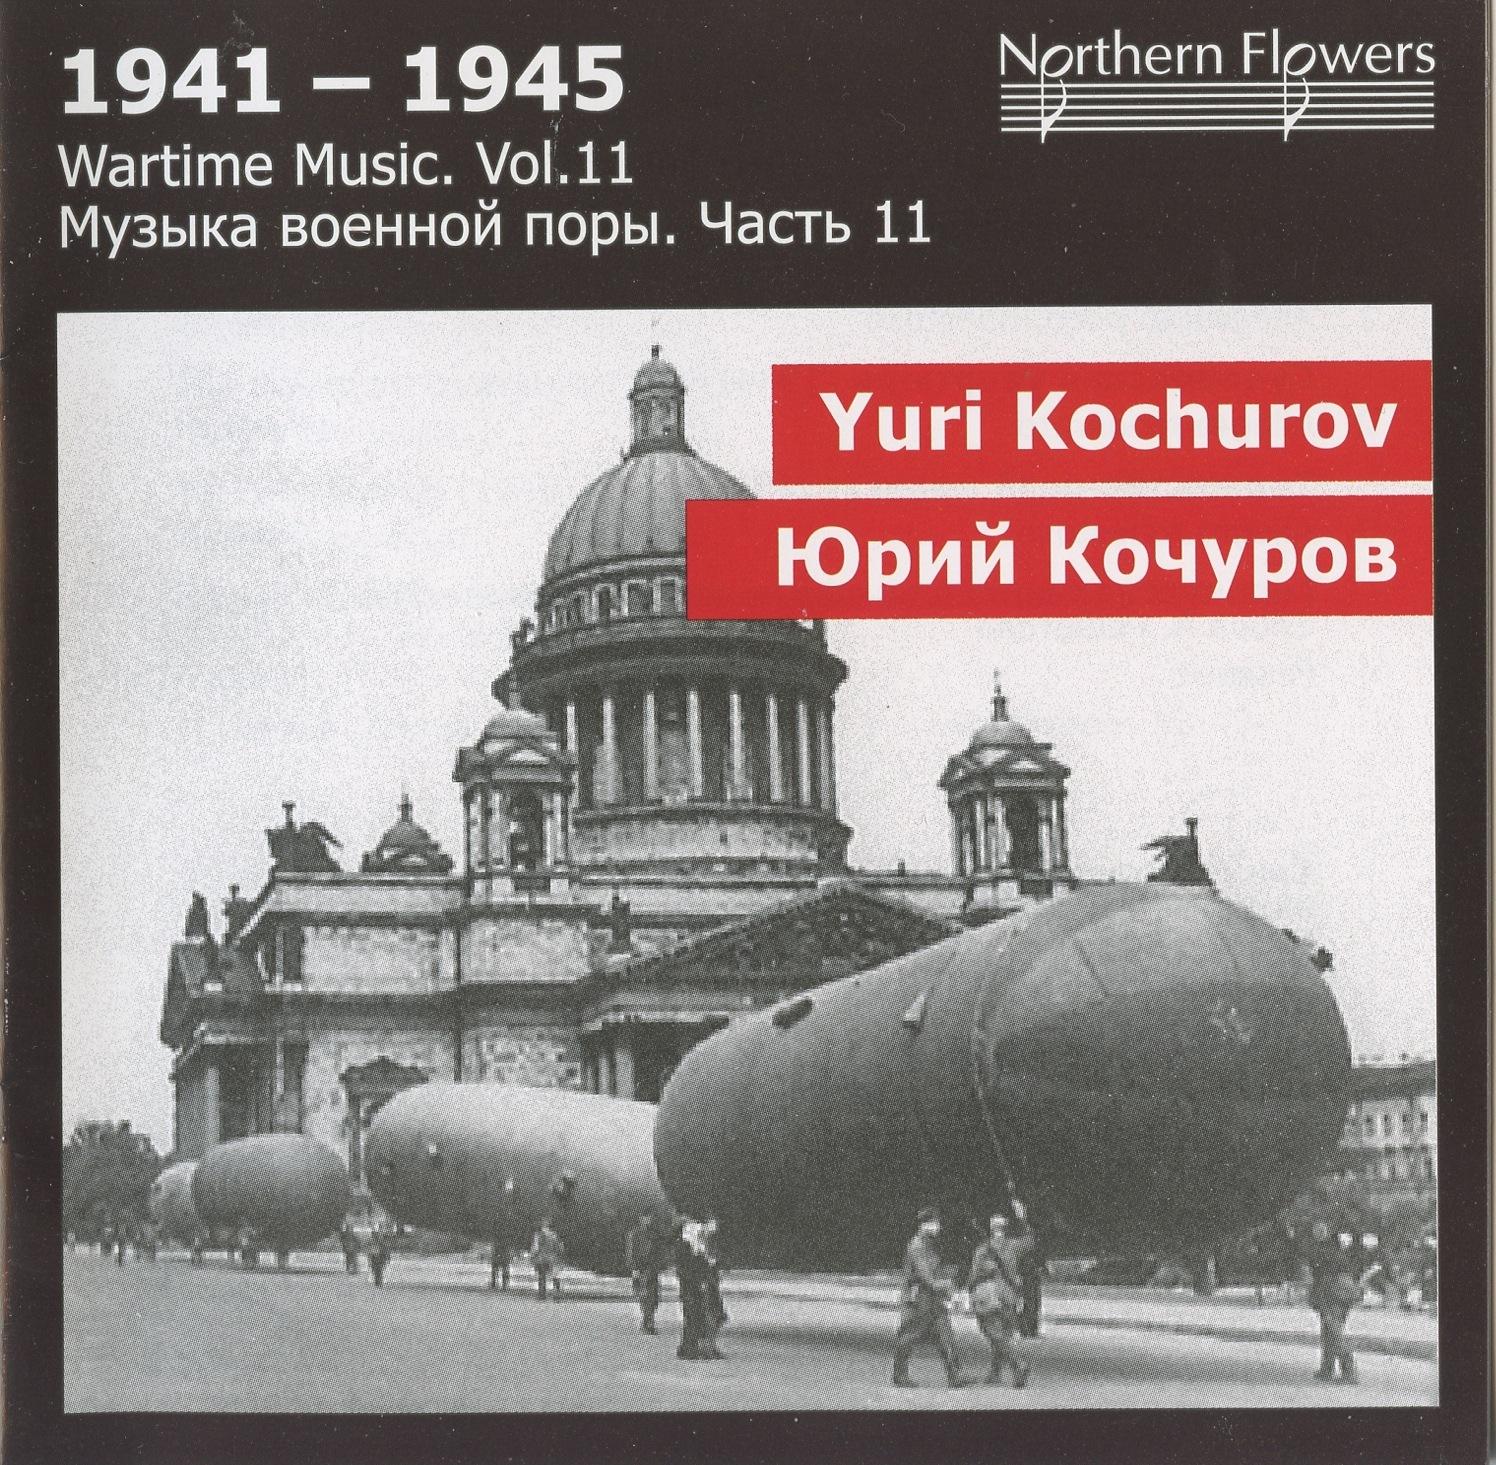 1941-1945: Wartime Music, Vol. 11